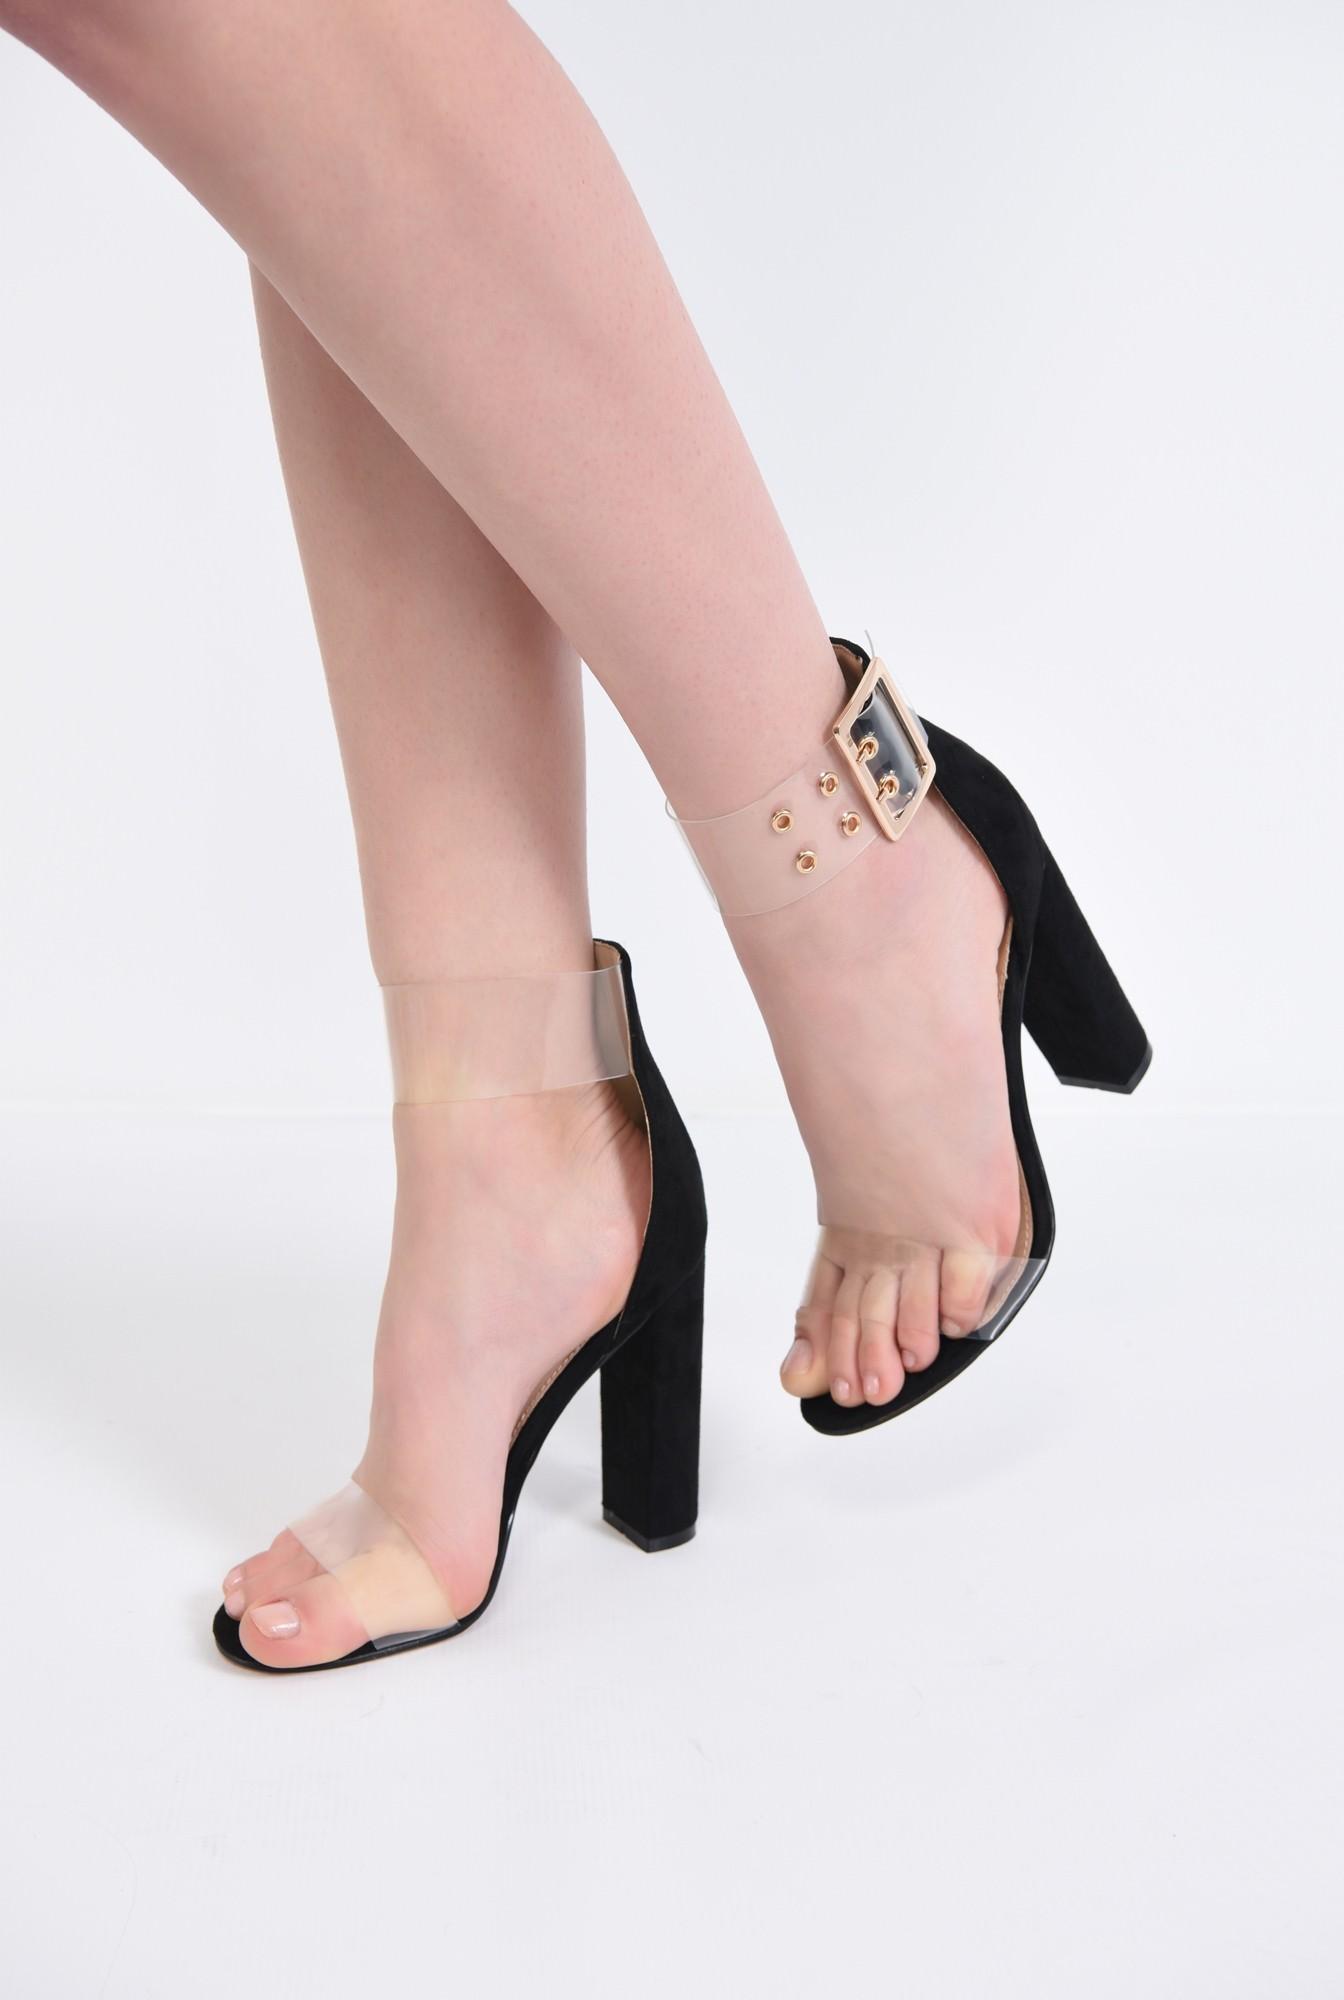 1 - sandale dama, toc gros, capse, auriu